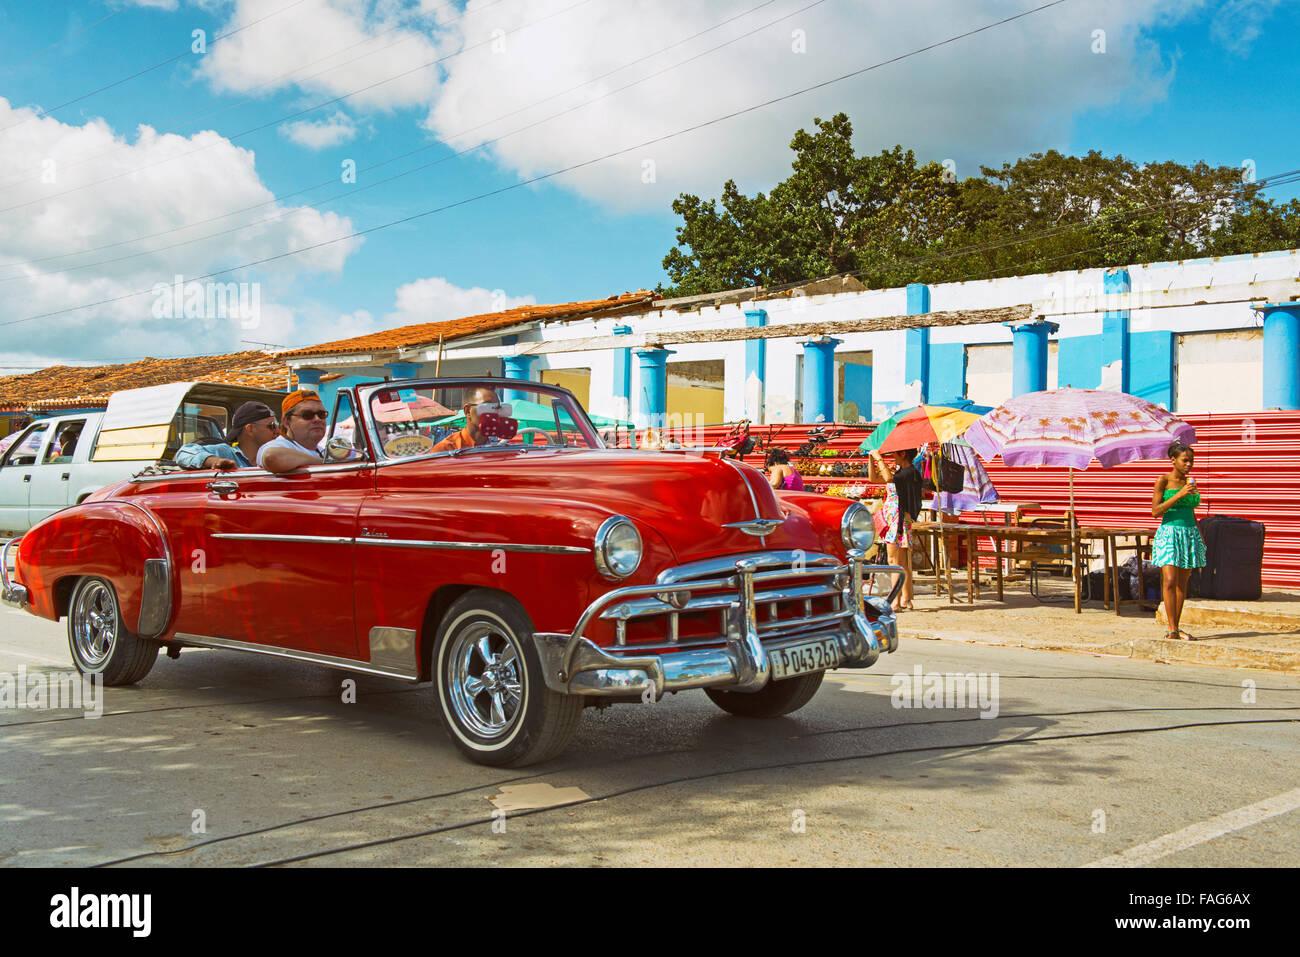 Classic Car Kuba, Vintage Old Taxi-Tour durch die Stadt von Vinales Stockbild